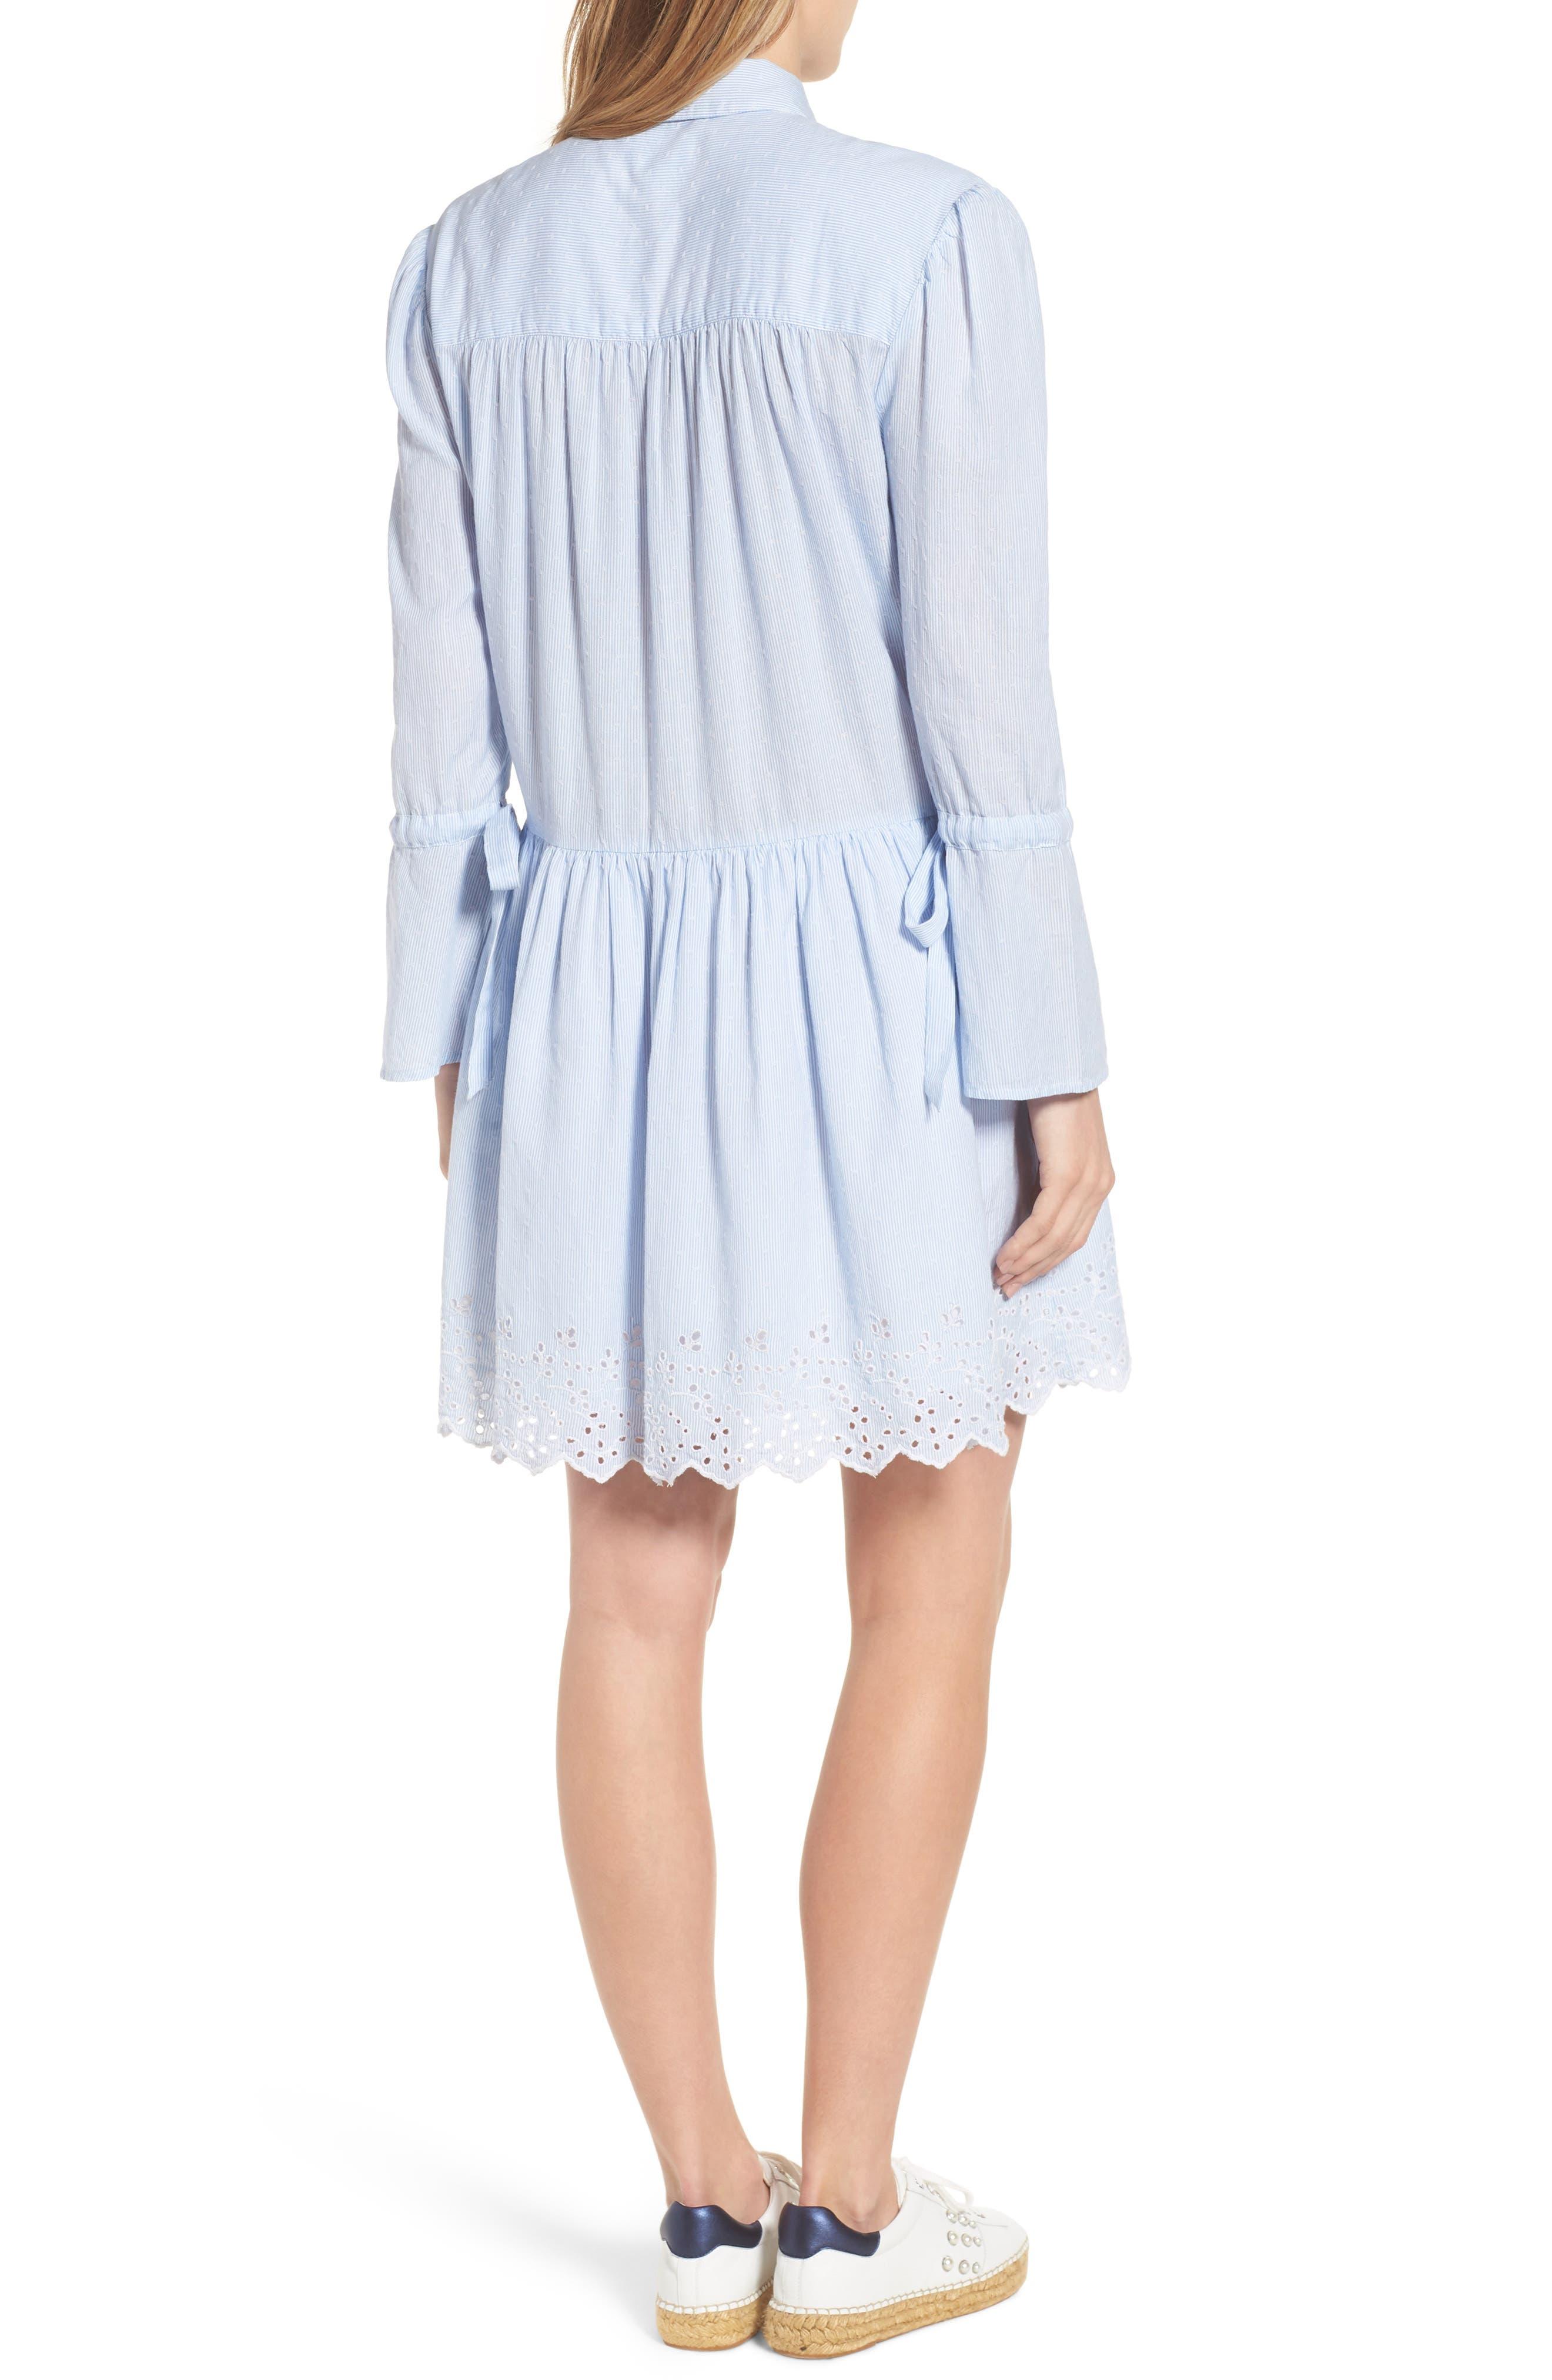 Pinstripe Eyelet Trim Cotton Shirtdress,                             Alternate thumbnail 2, color,                             Blue- White Stripe